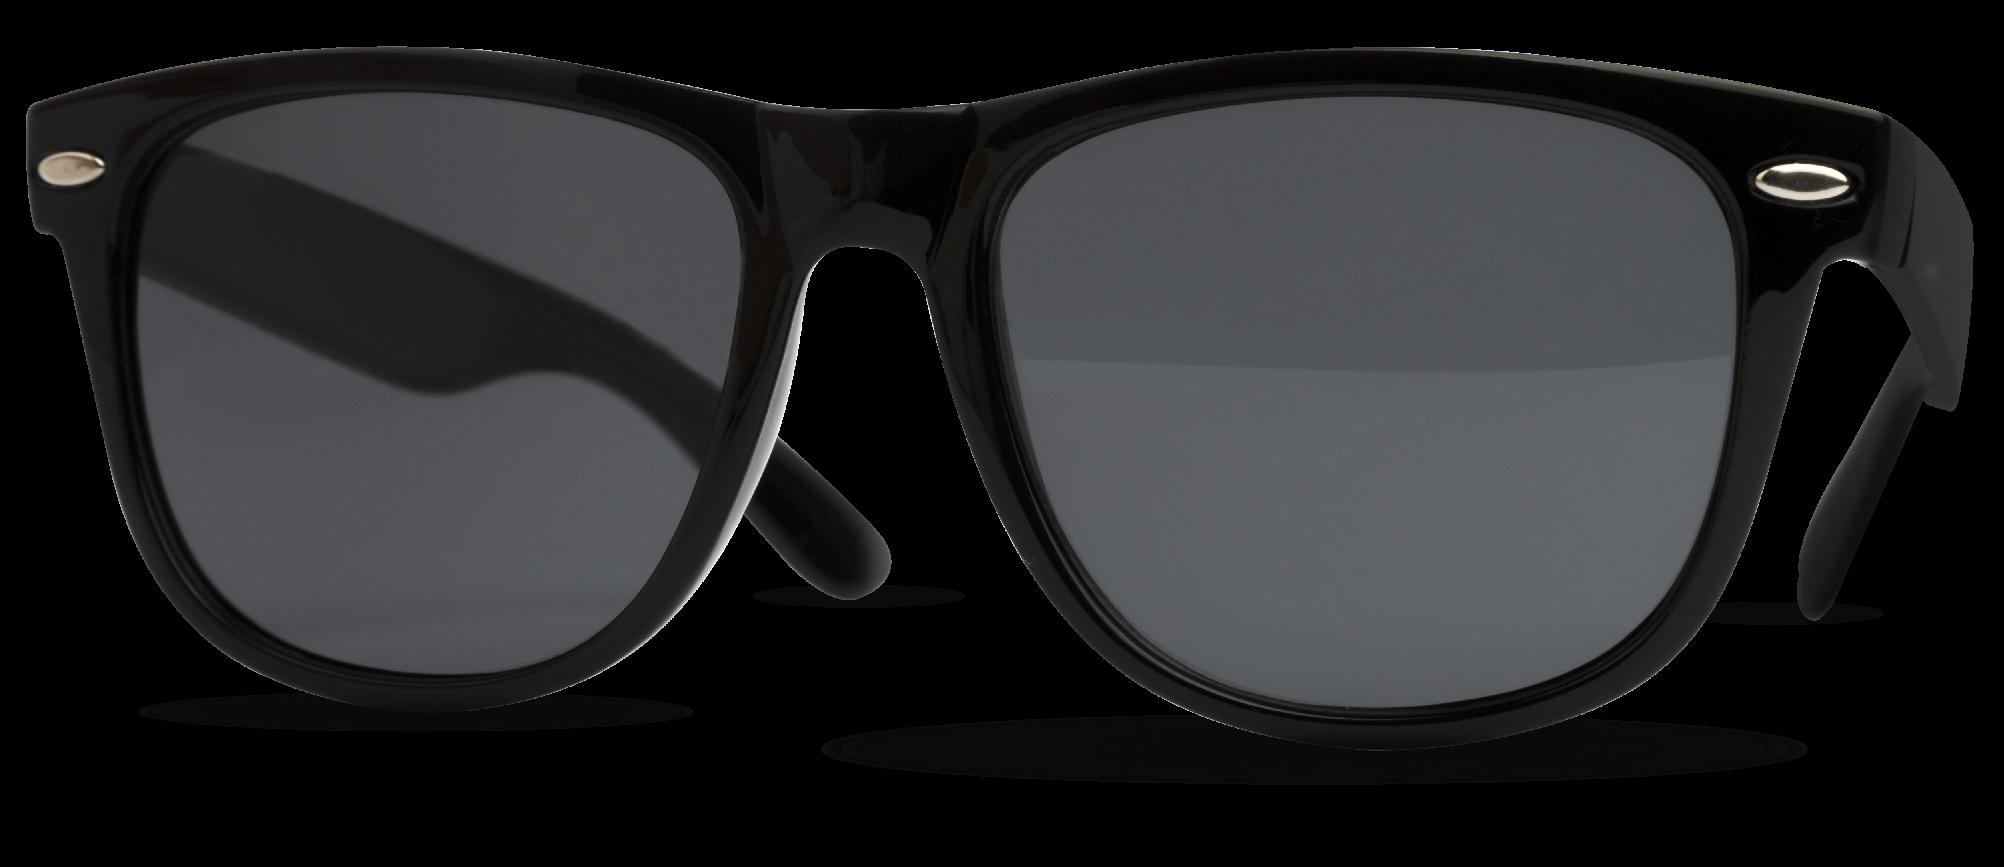 Norm glasses 2